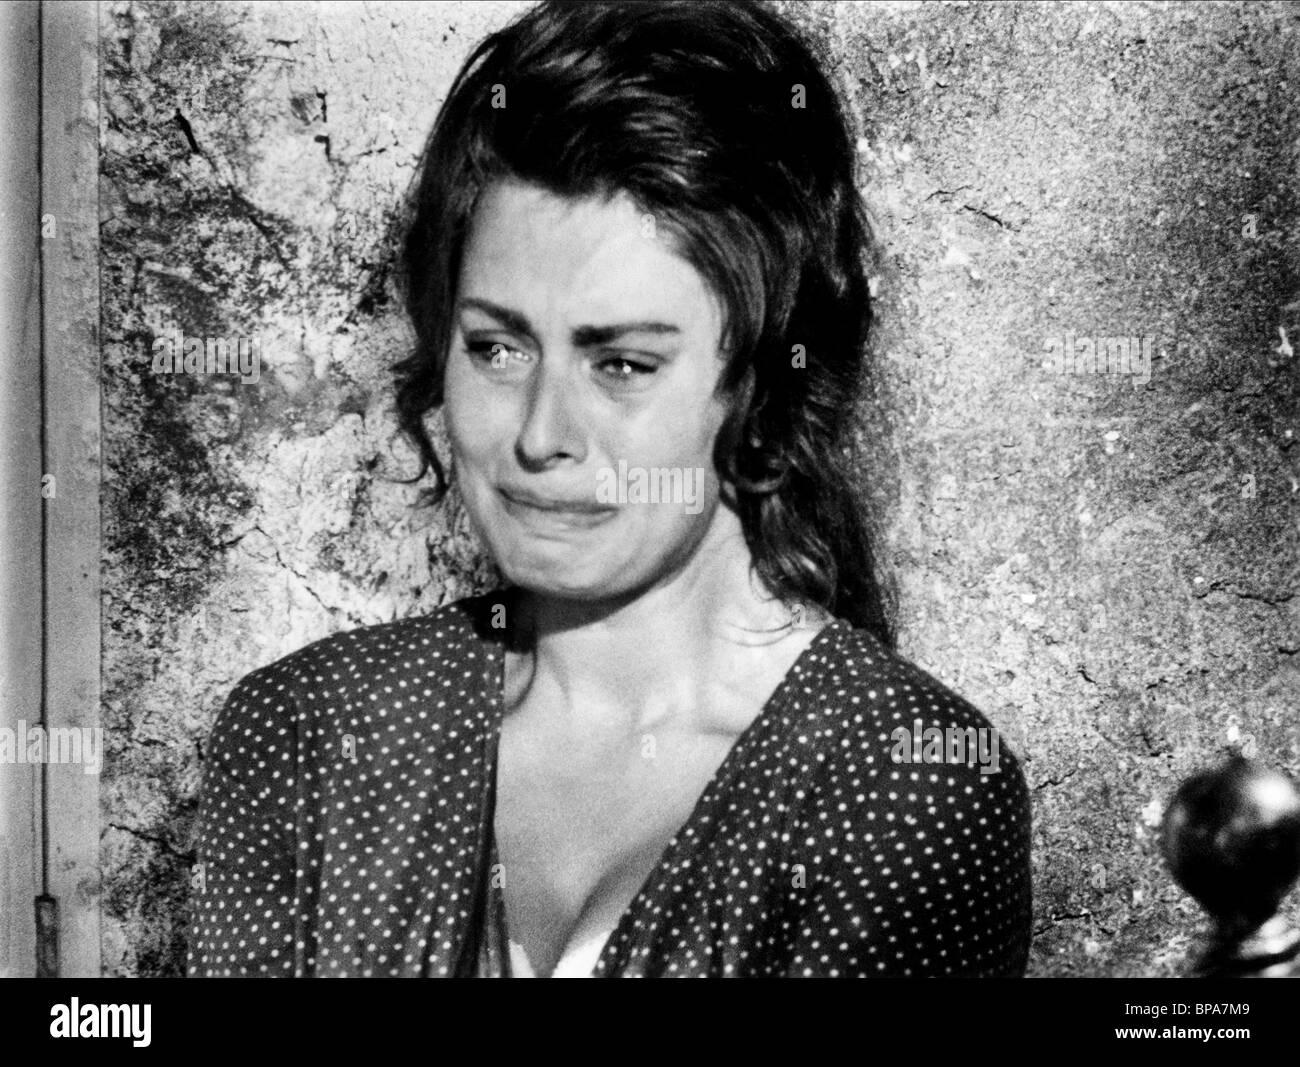 SOPHIA LOREN ZWEI FRAUEN; LA CIOCIARA (1960 Stockfotografie - Alamy